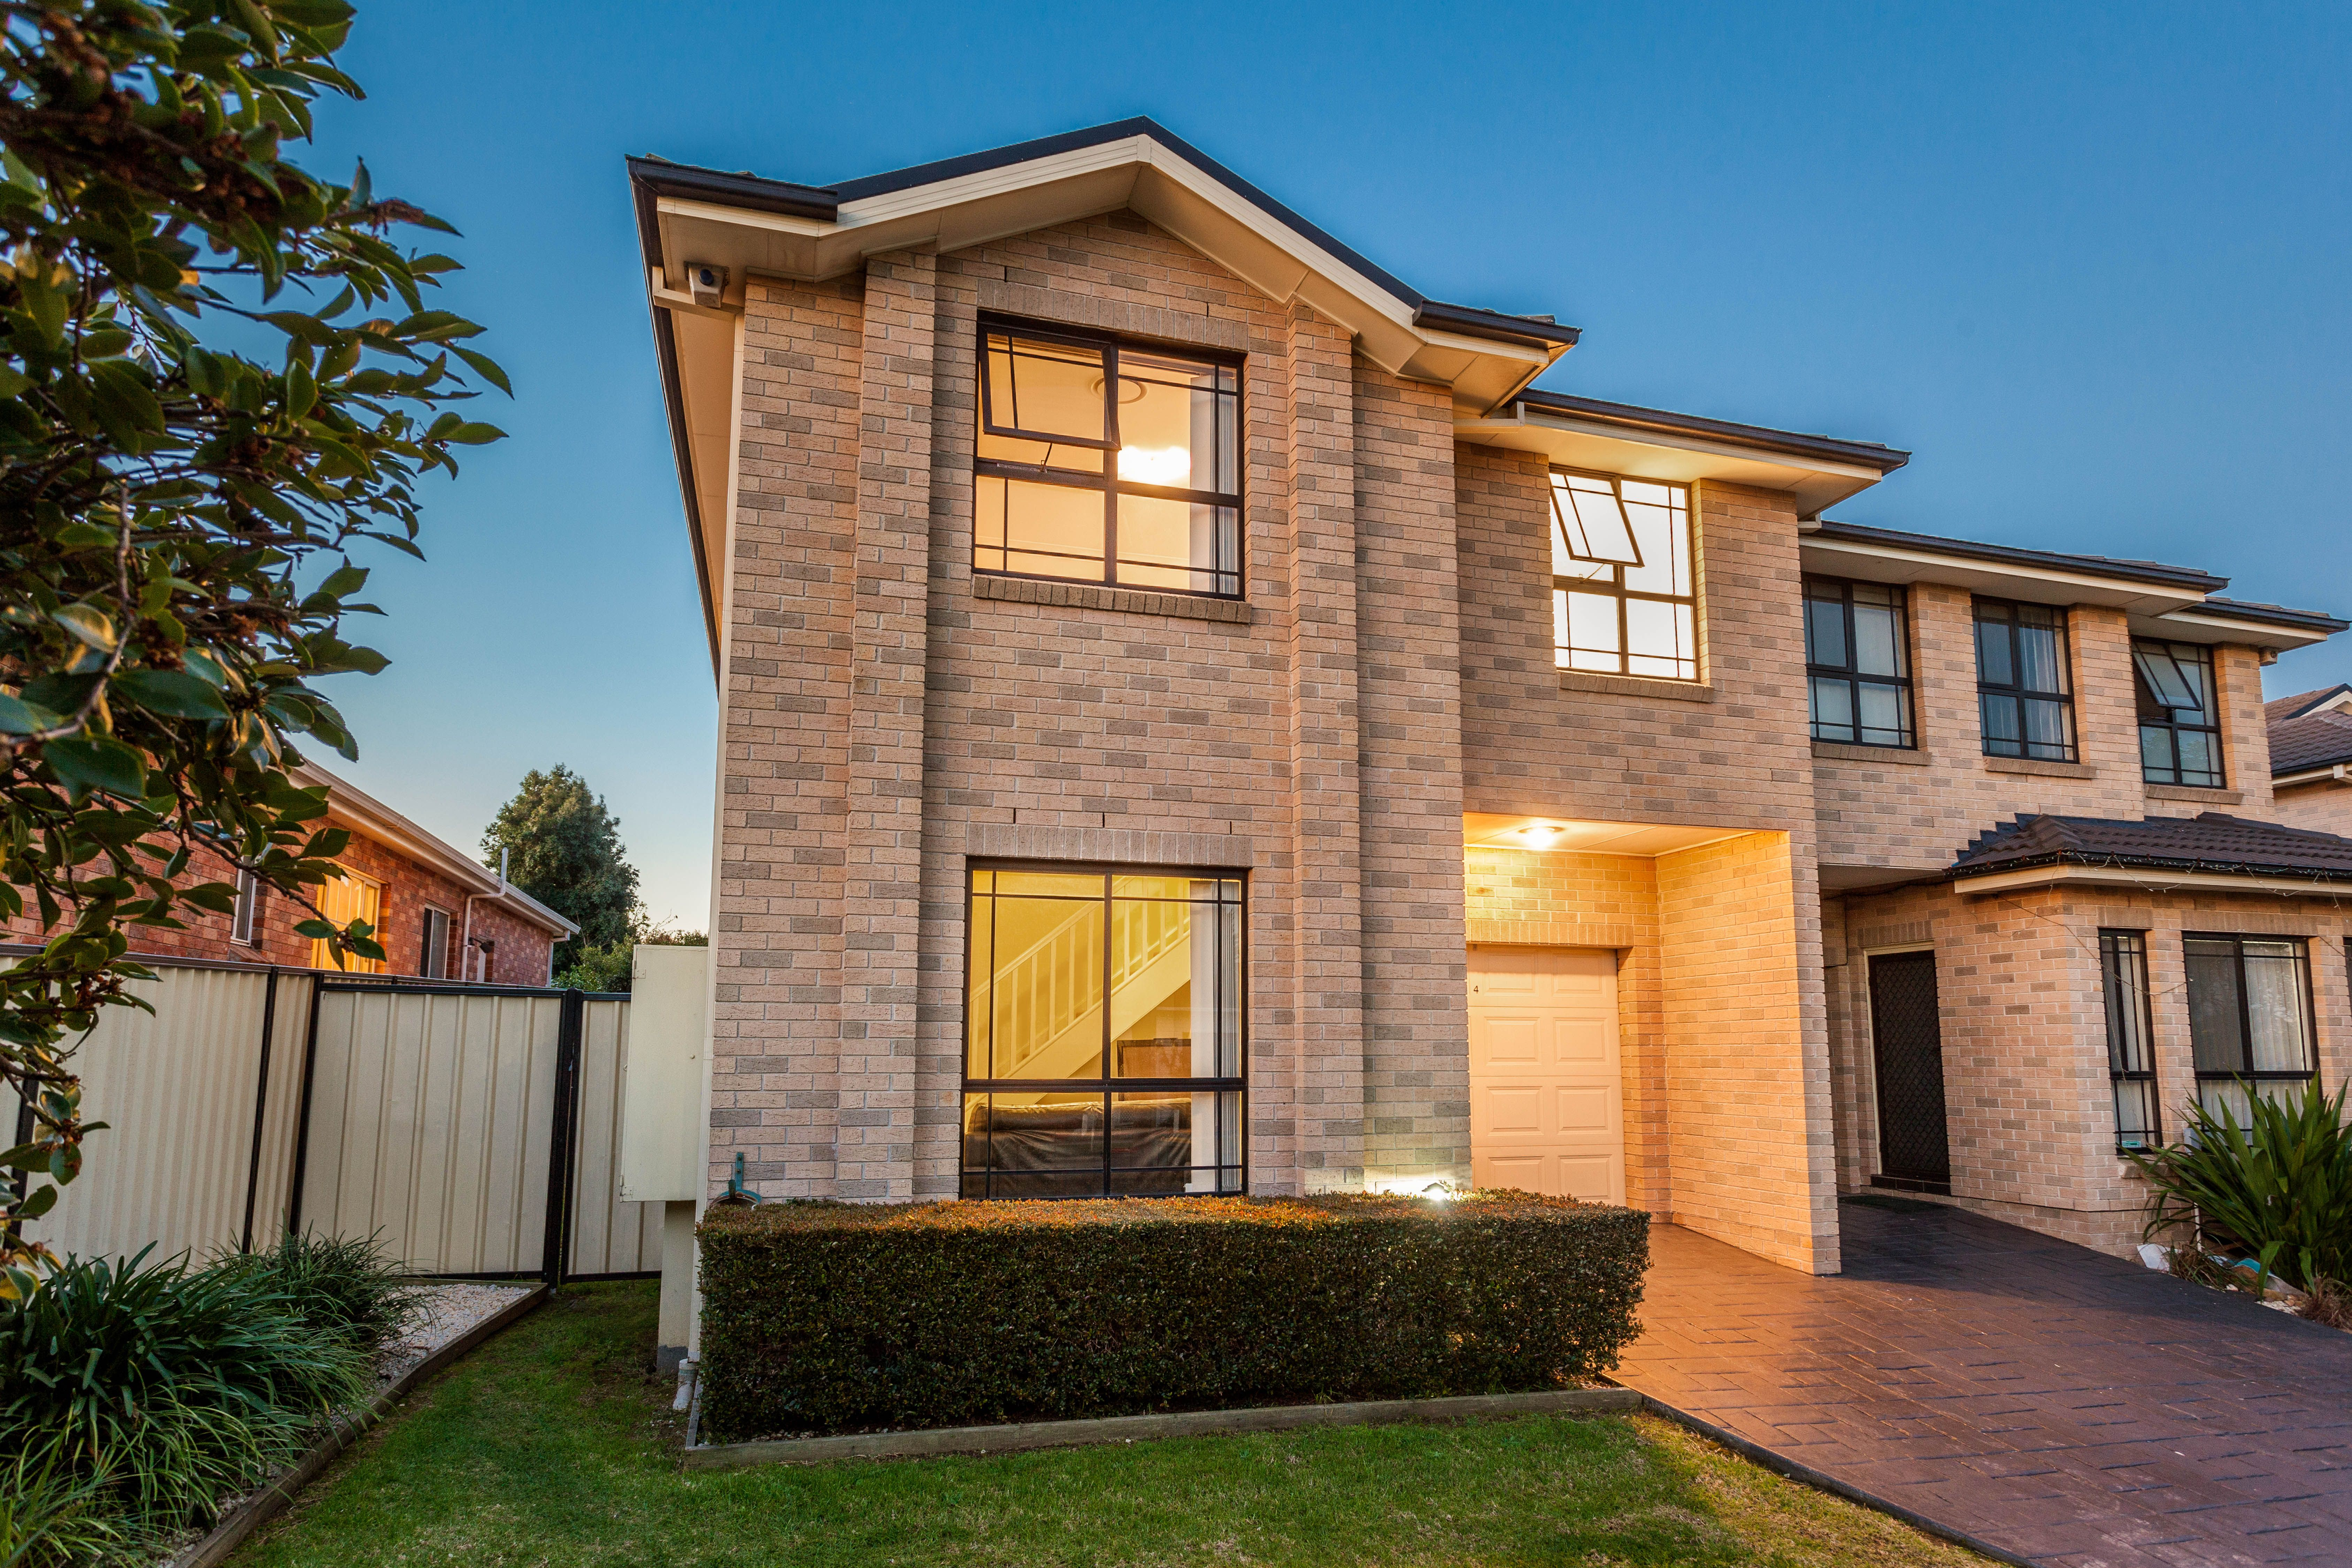 4/54 Yanderra Street, Condell Park NSW 2200